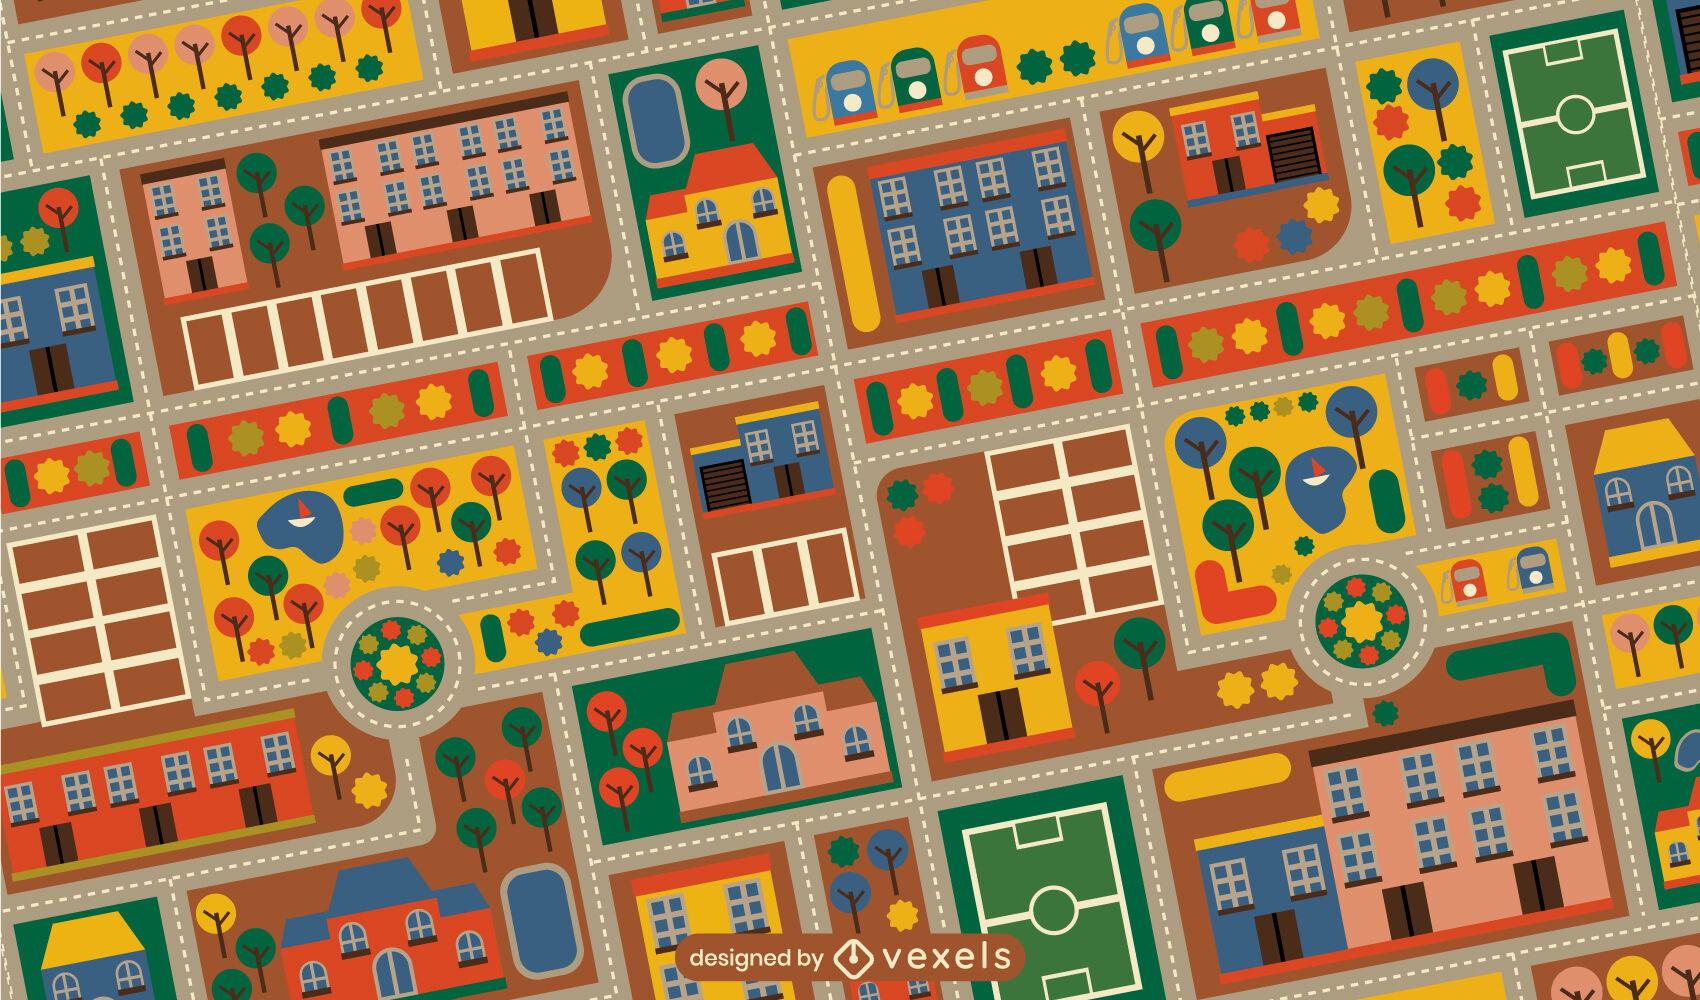 Colorful childrens city carpet pattern design